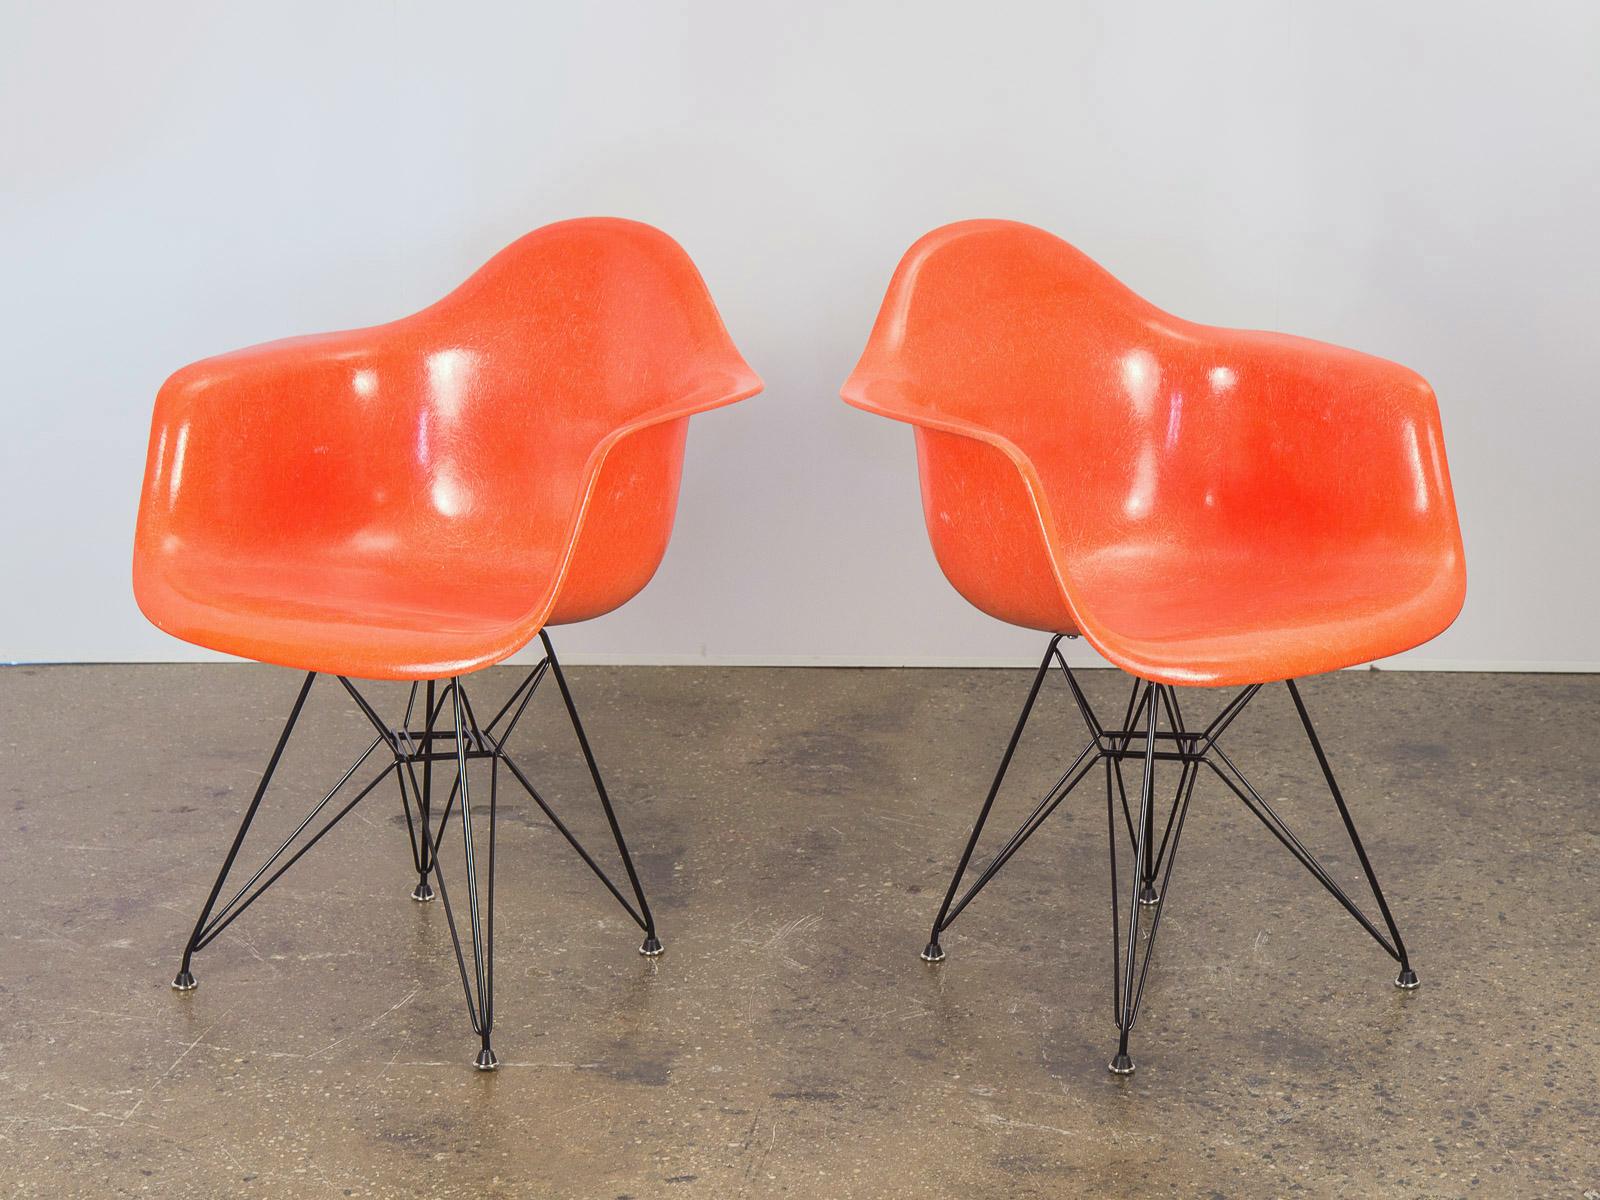 eames arm chair hanging egg kmart pair of orange armchair shells oam open air modern fiberglass armchairs for herman miller on black eiffel base 1 jpg